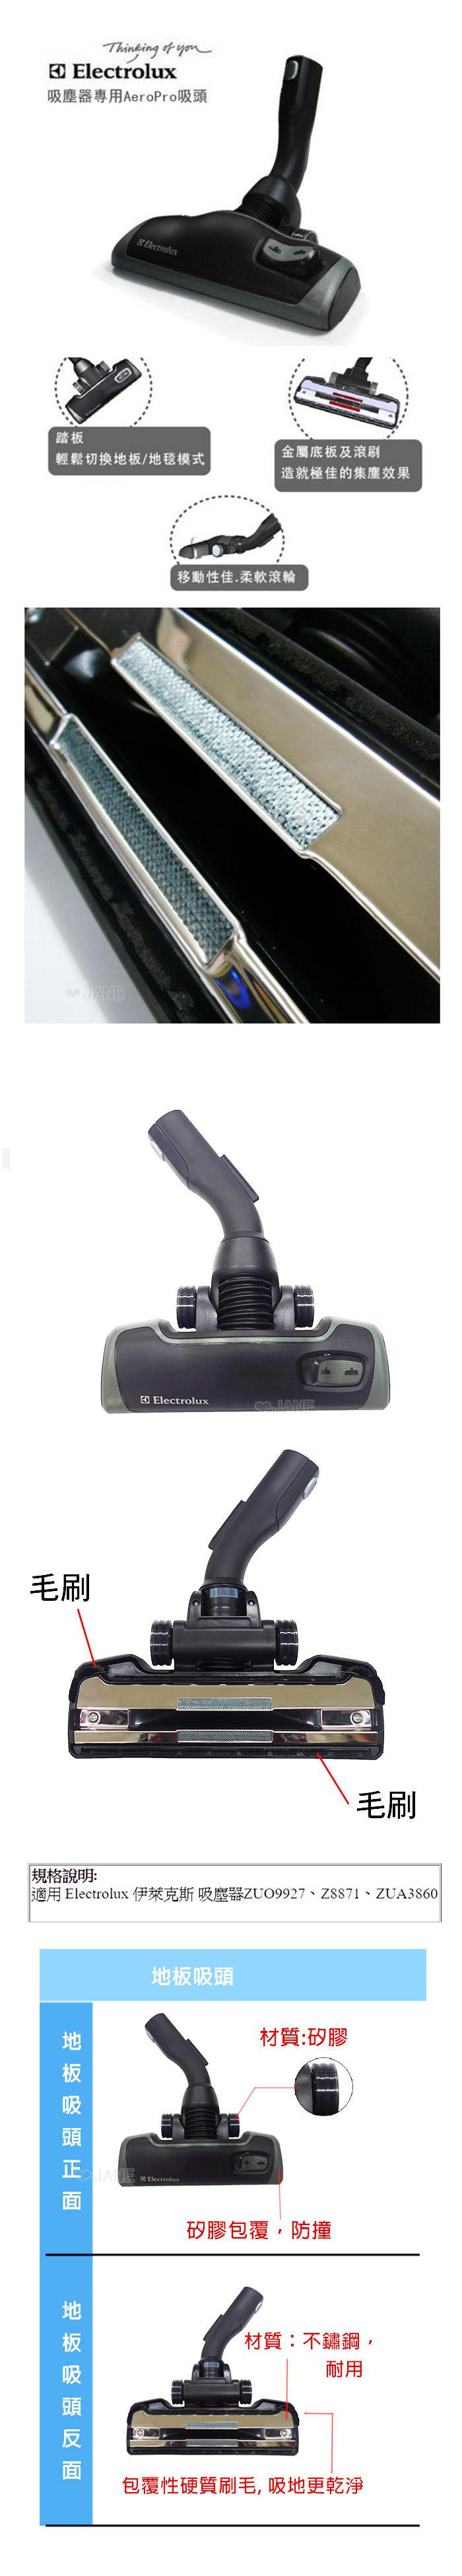 Electrolux伊萊克斯吸塵器專用 AeroPro地板吸頭 適用型號ZUO9927、Z8871、ZUA3860